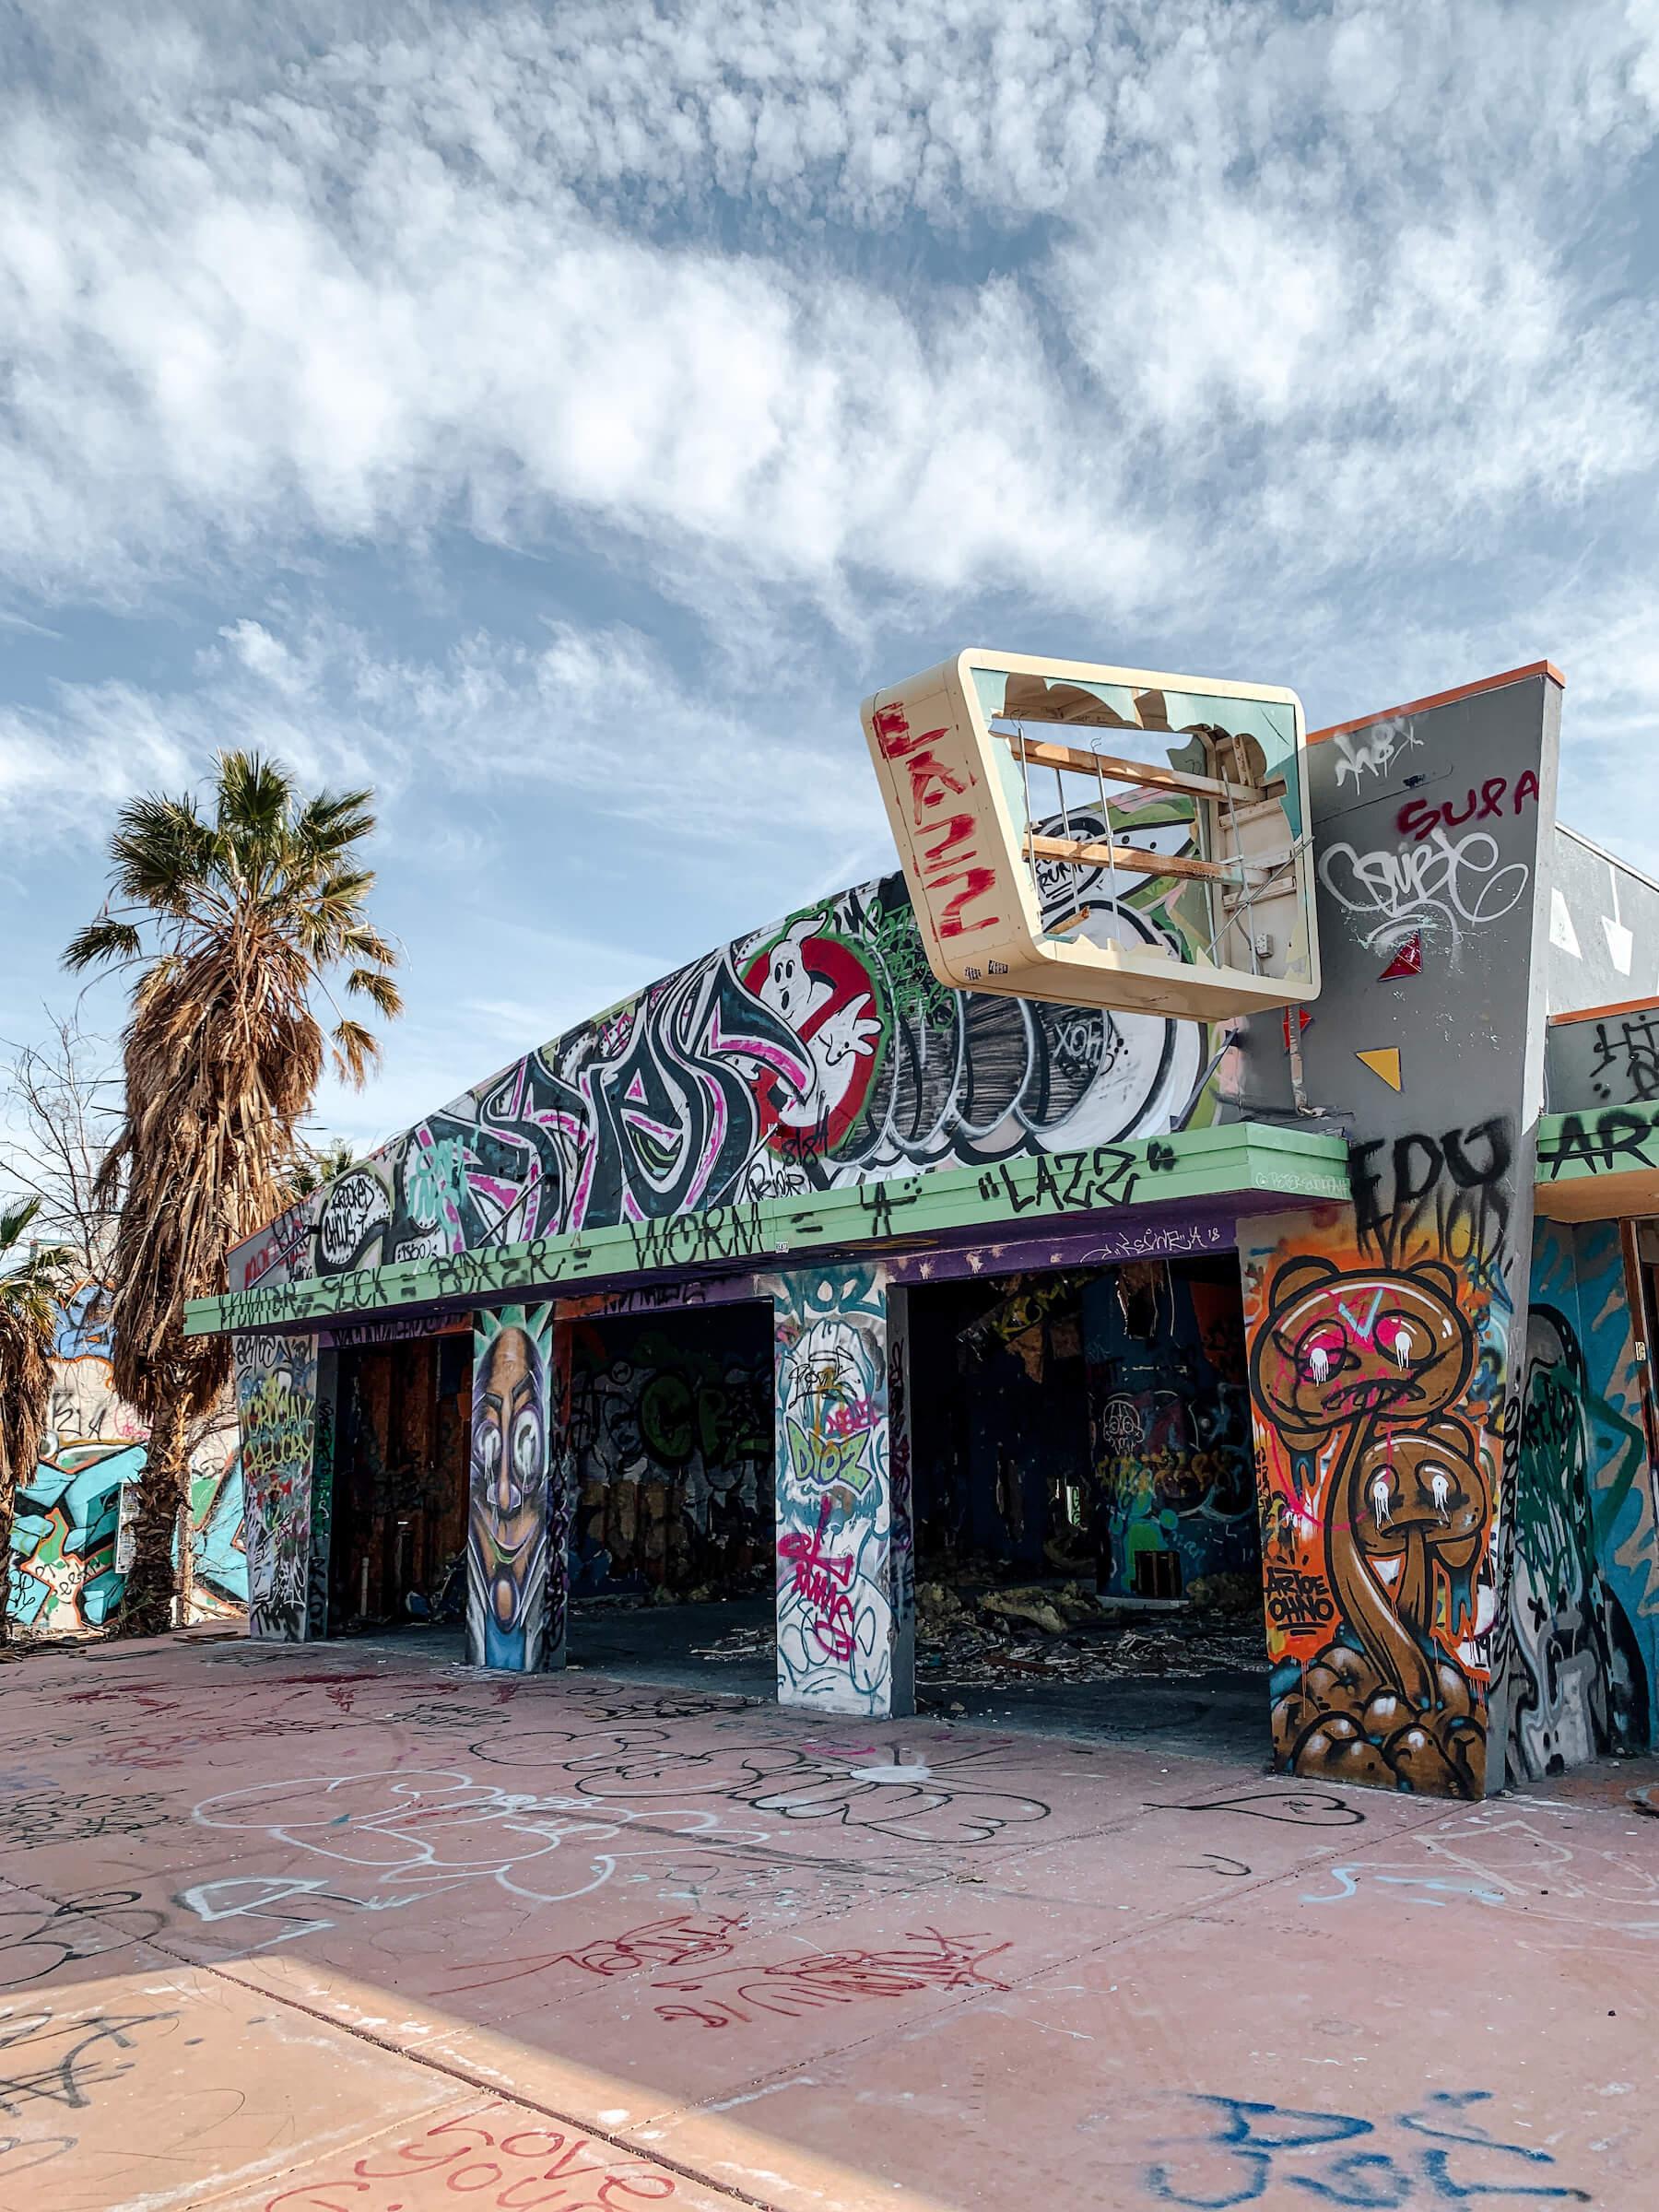 Rock-A-Hula Waterpark - méconnus incontournables Los Angeles - voyage en Californie